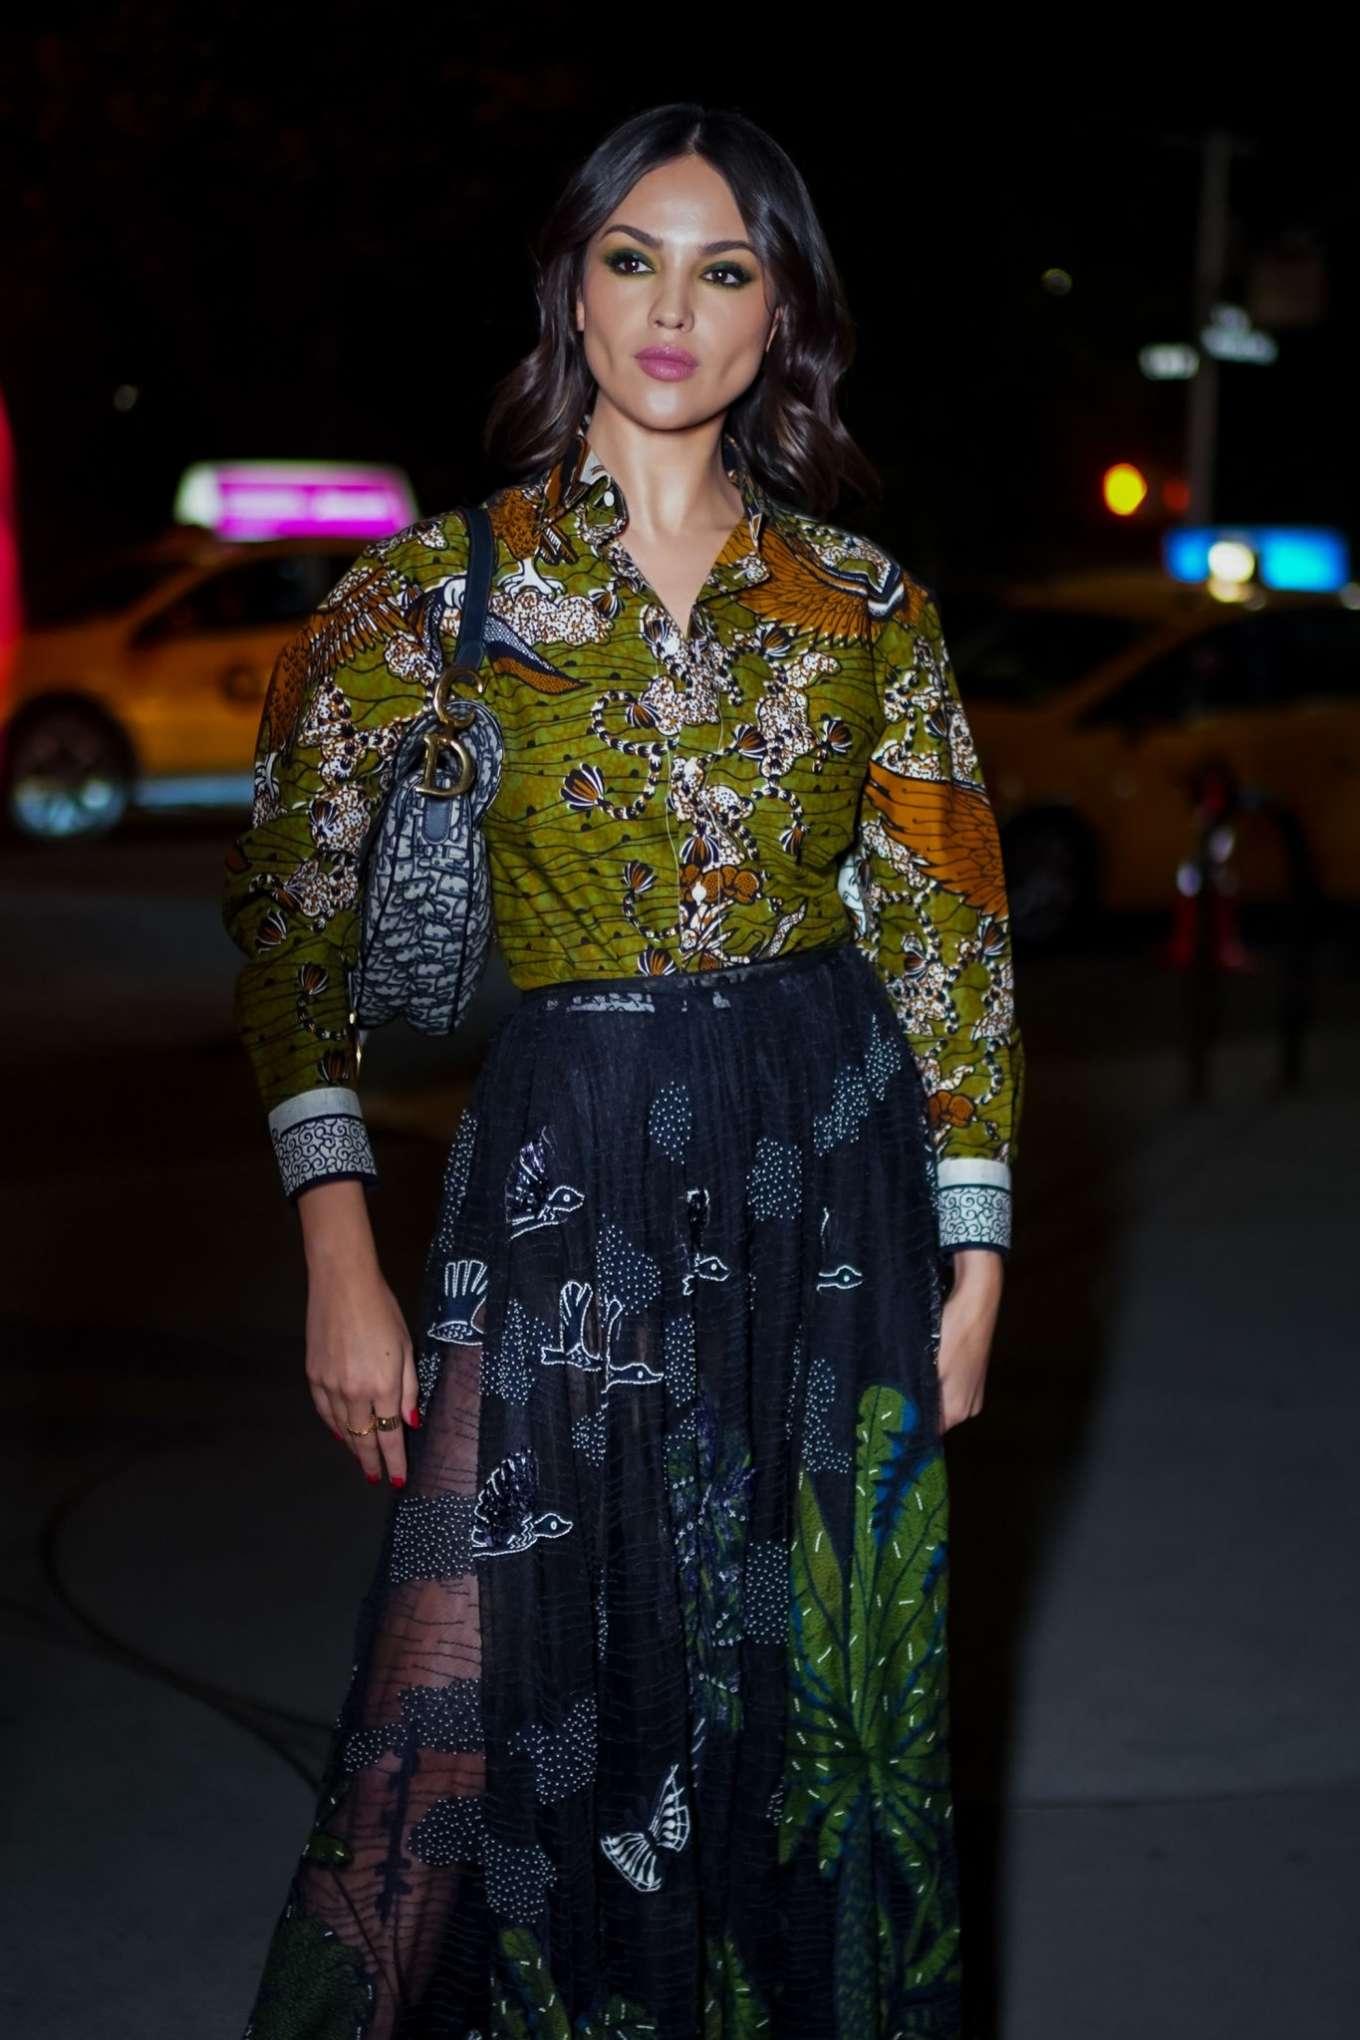 Eiza Gonzalez - Arrives at Guggenheim International Gala in New York